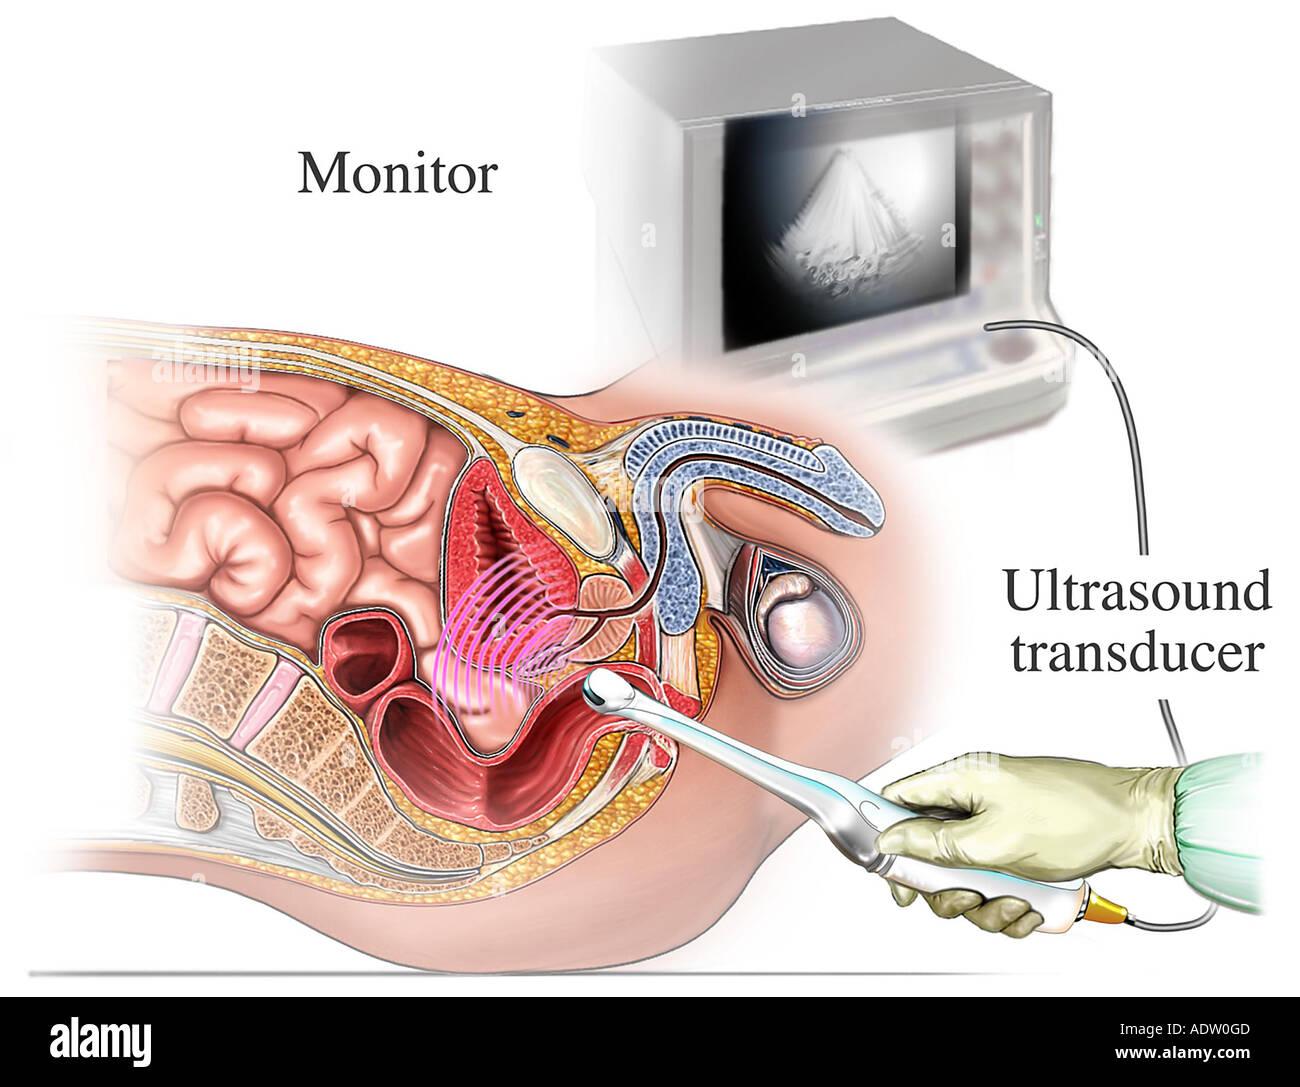 Cancer Prostate Ultrasound Stock Photos & Cancer Prostate Ultrasound ...